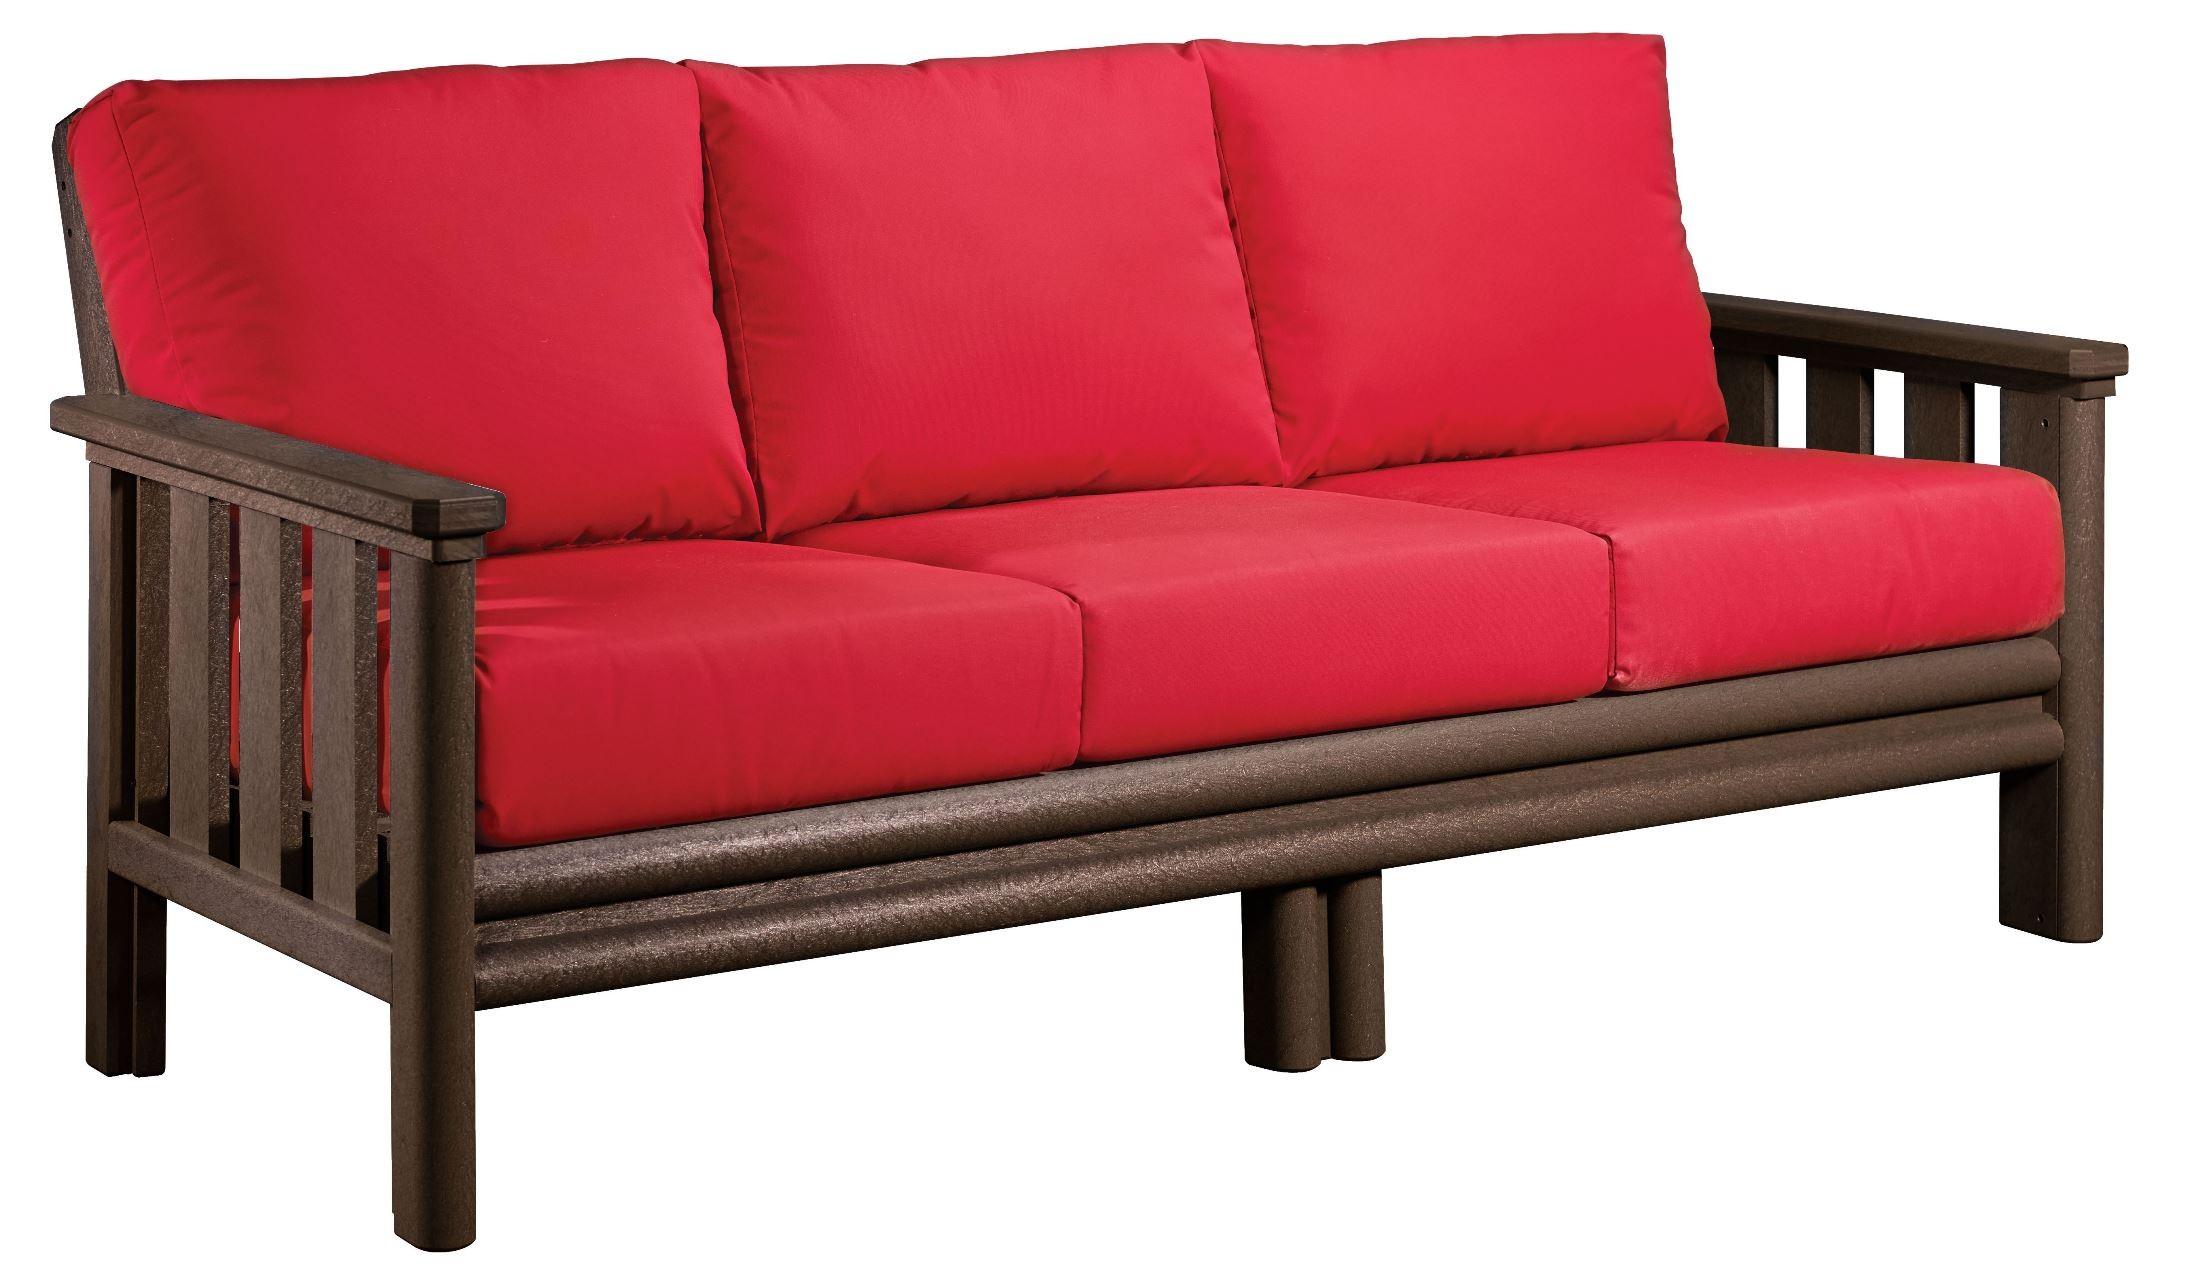 Stratford Chocolate Sofa With Jockey Red Sunbrella